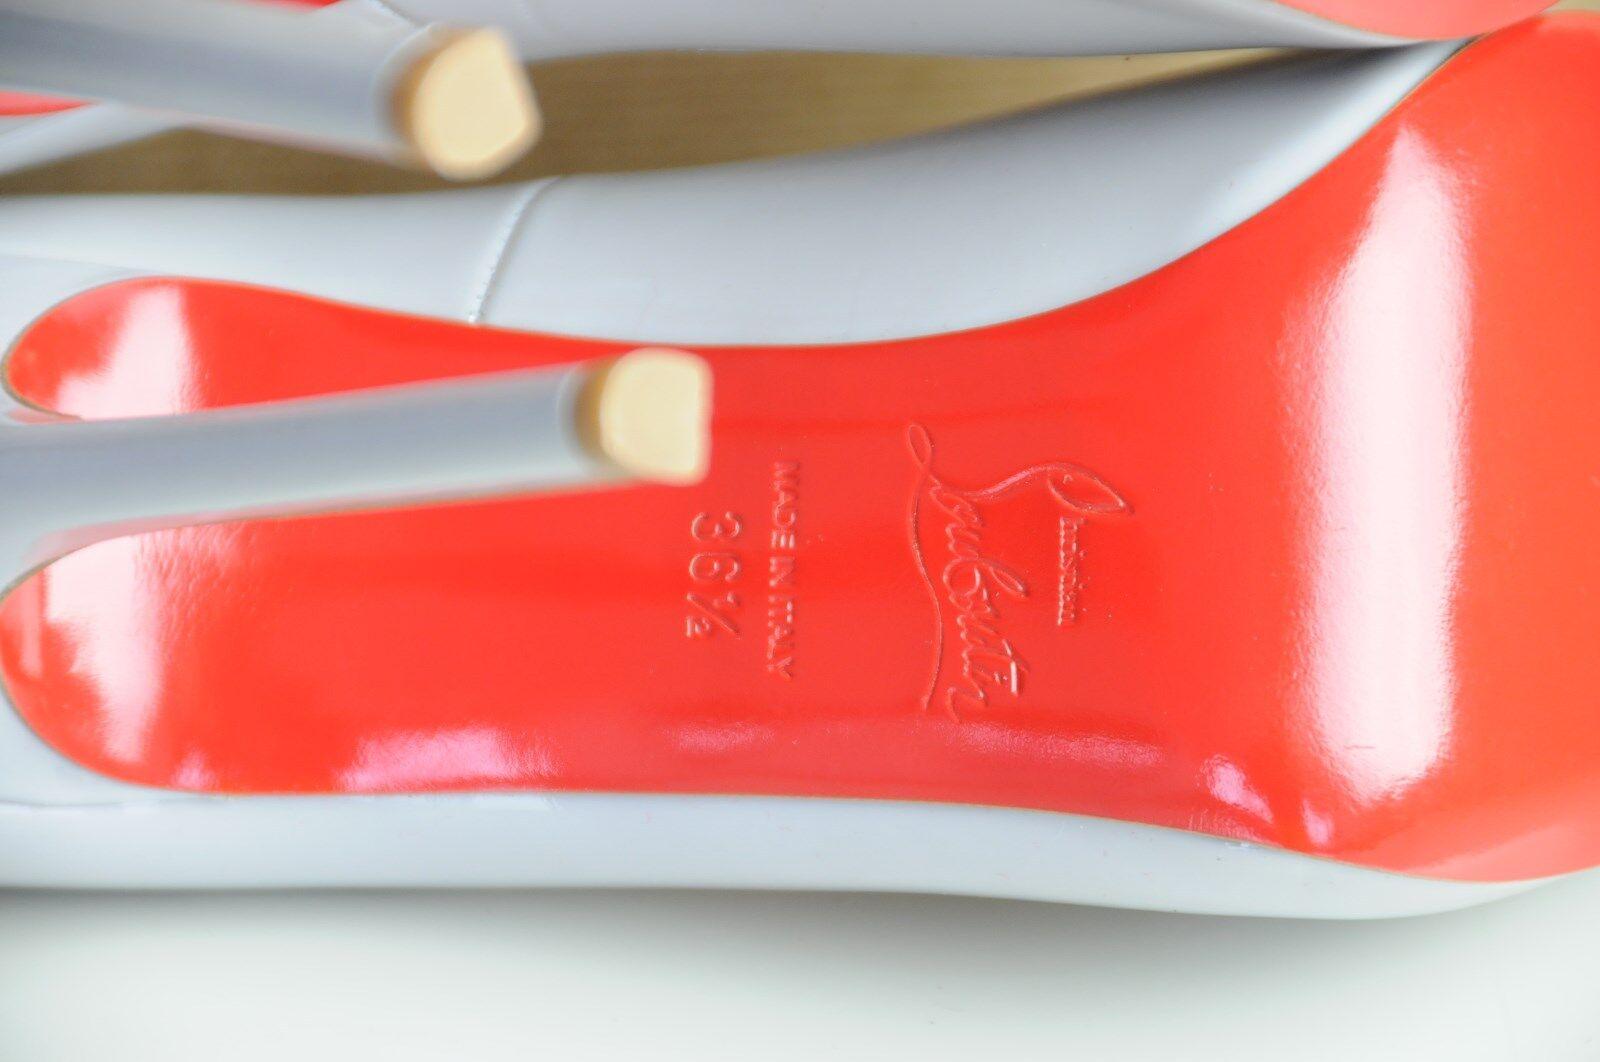 New CHRISTIAN LOUBOUTIN FLO 120 PATENT Leather grau Peep Toe 35.5 Pumps schuhe 35.5 Toe 36 250b89